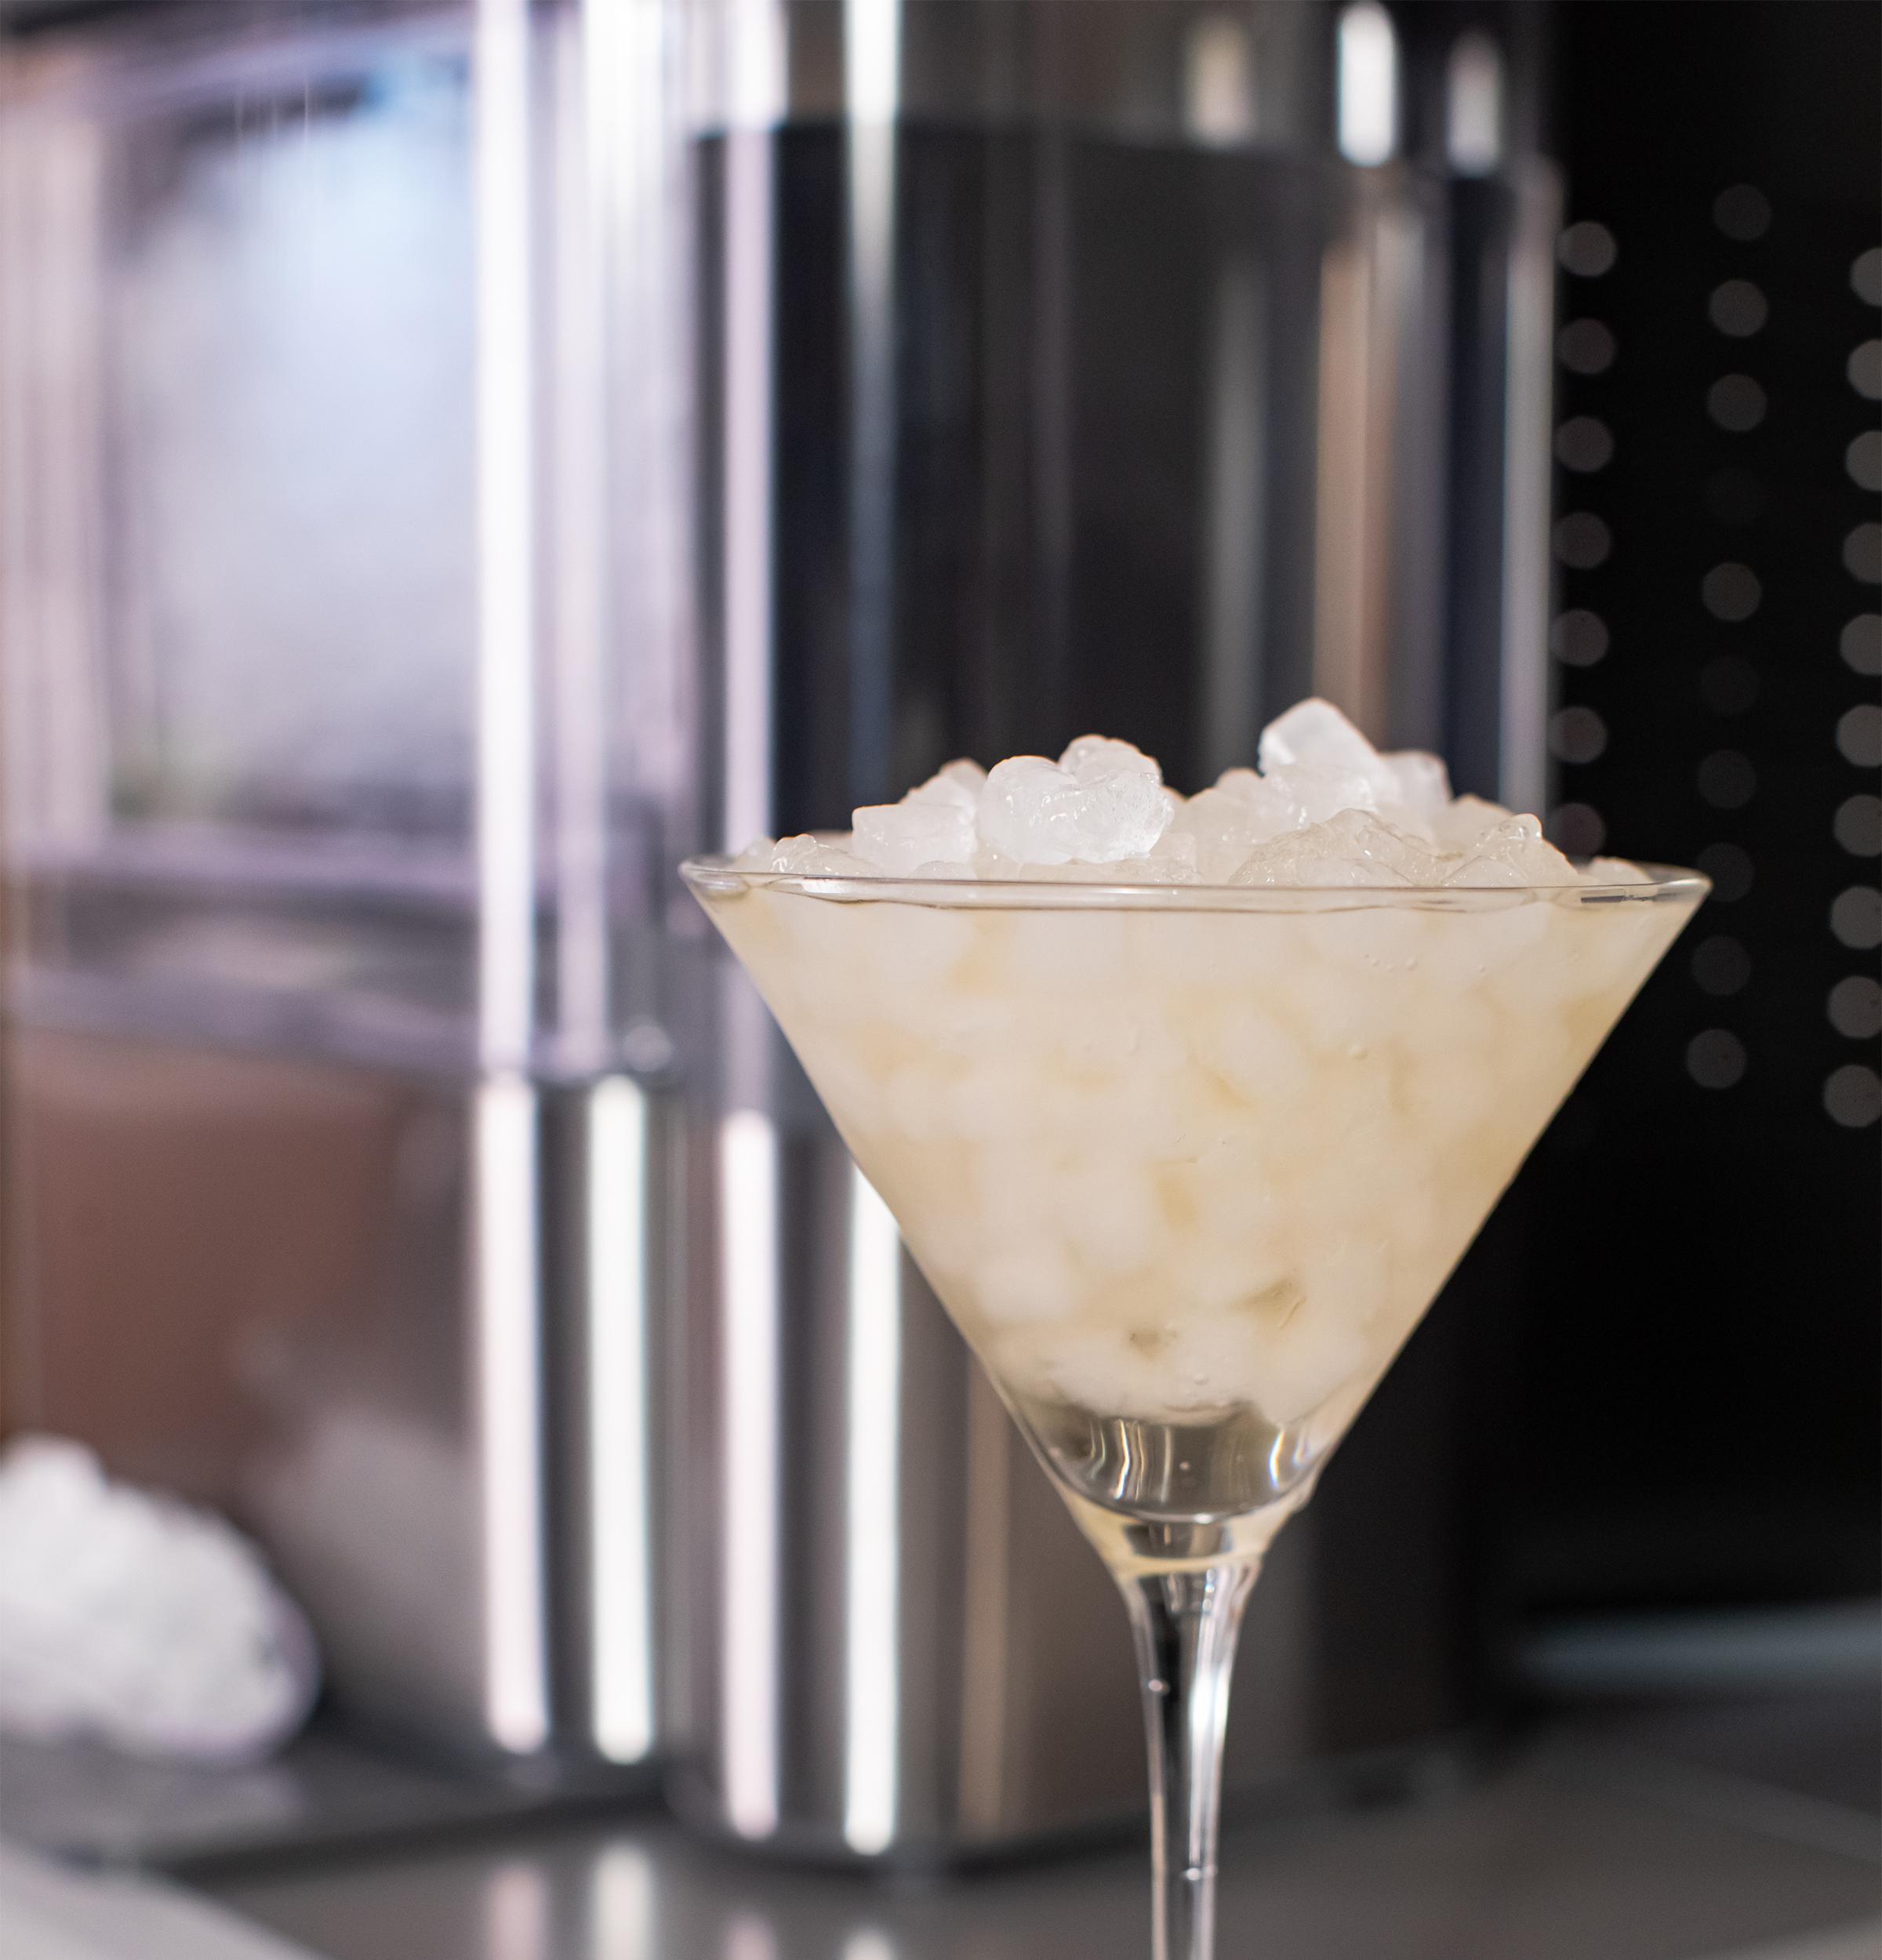 Xpio13bcbtge Ge Profile Tm Opal 2 0 Nugget Ice Maker Black Stainless Hamai Appliance